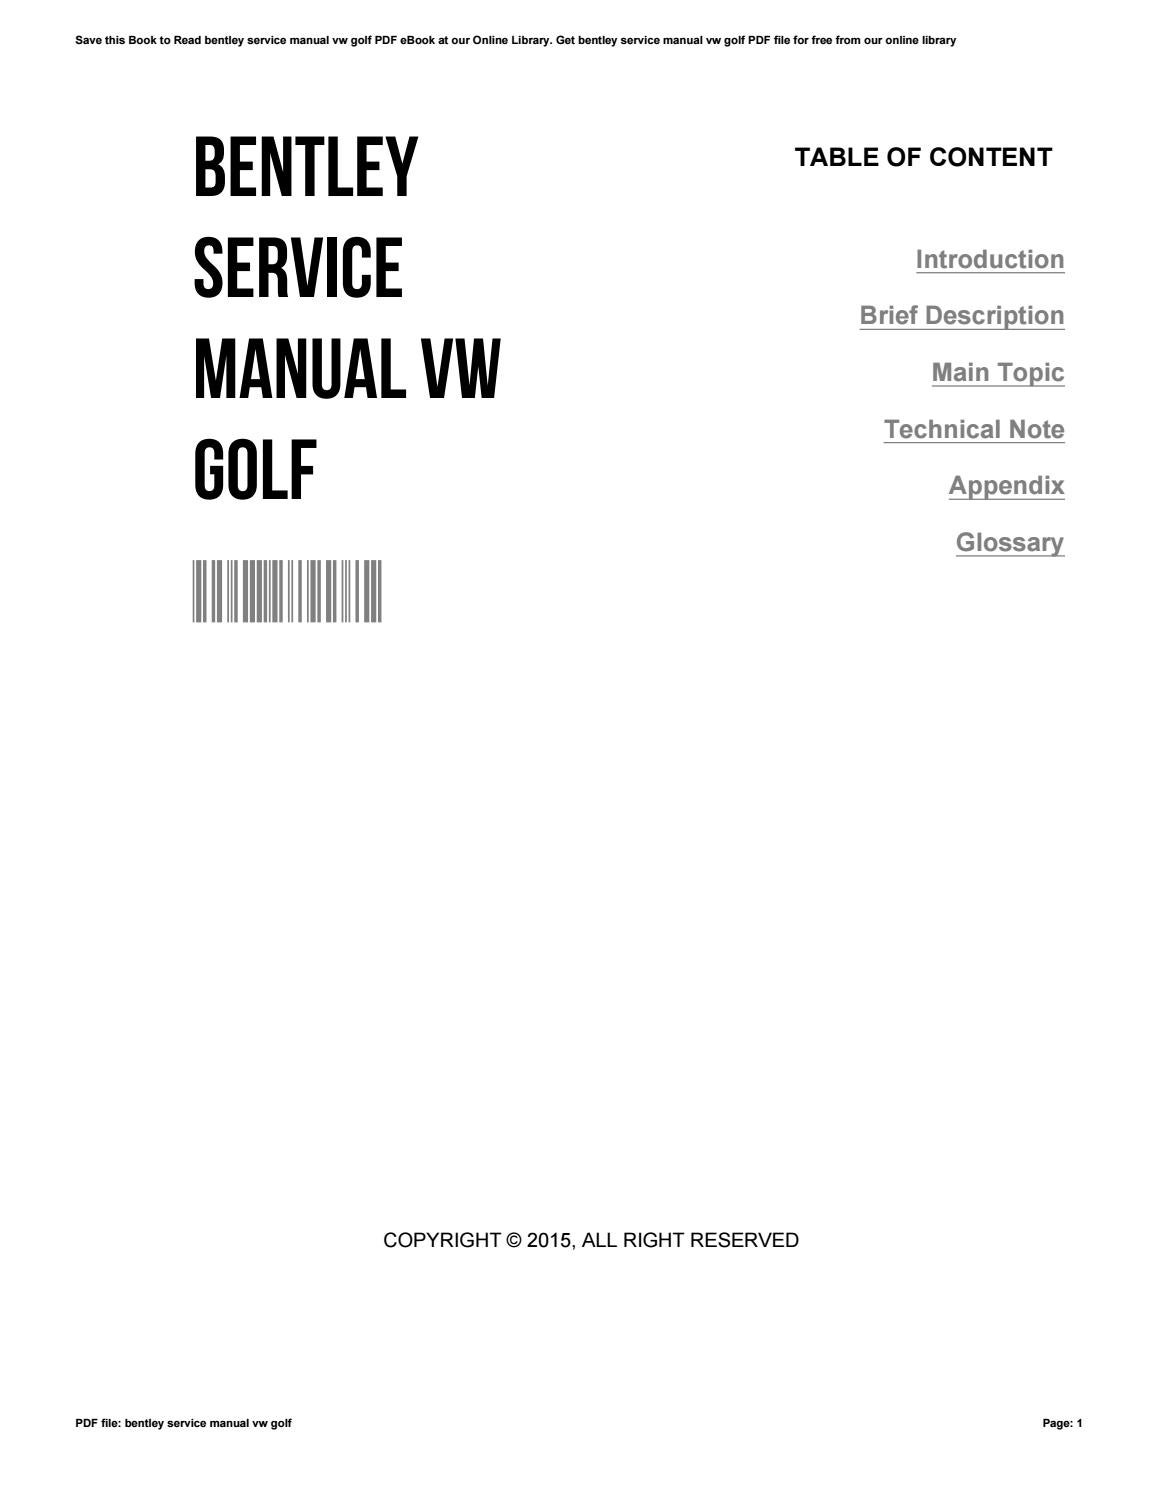 bentley service manual free download